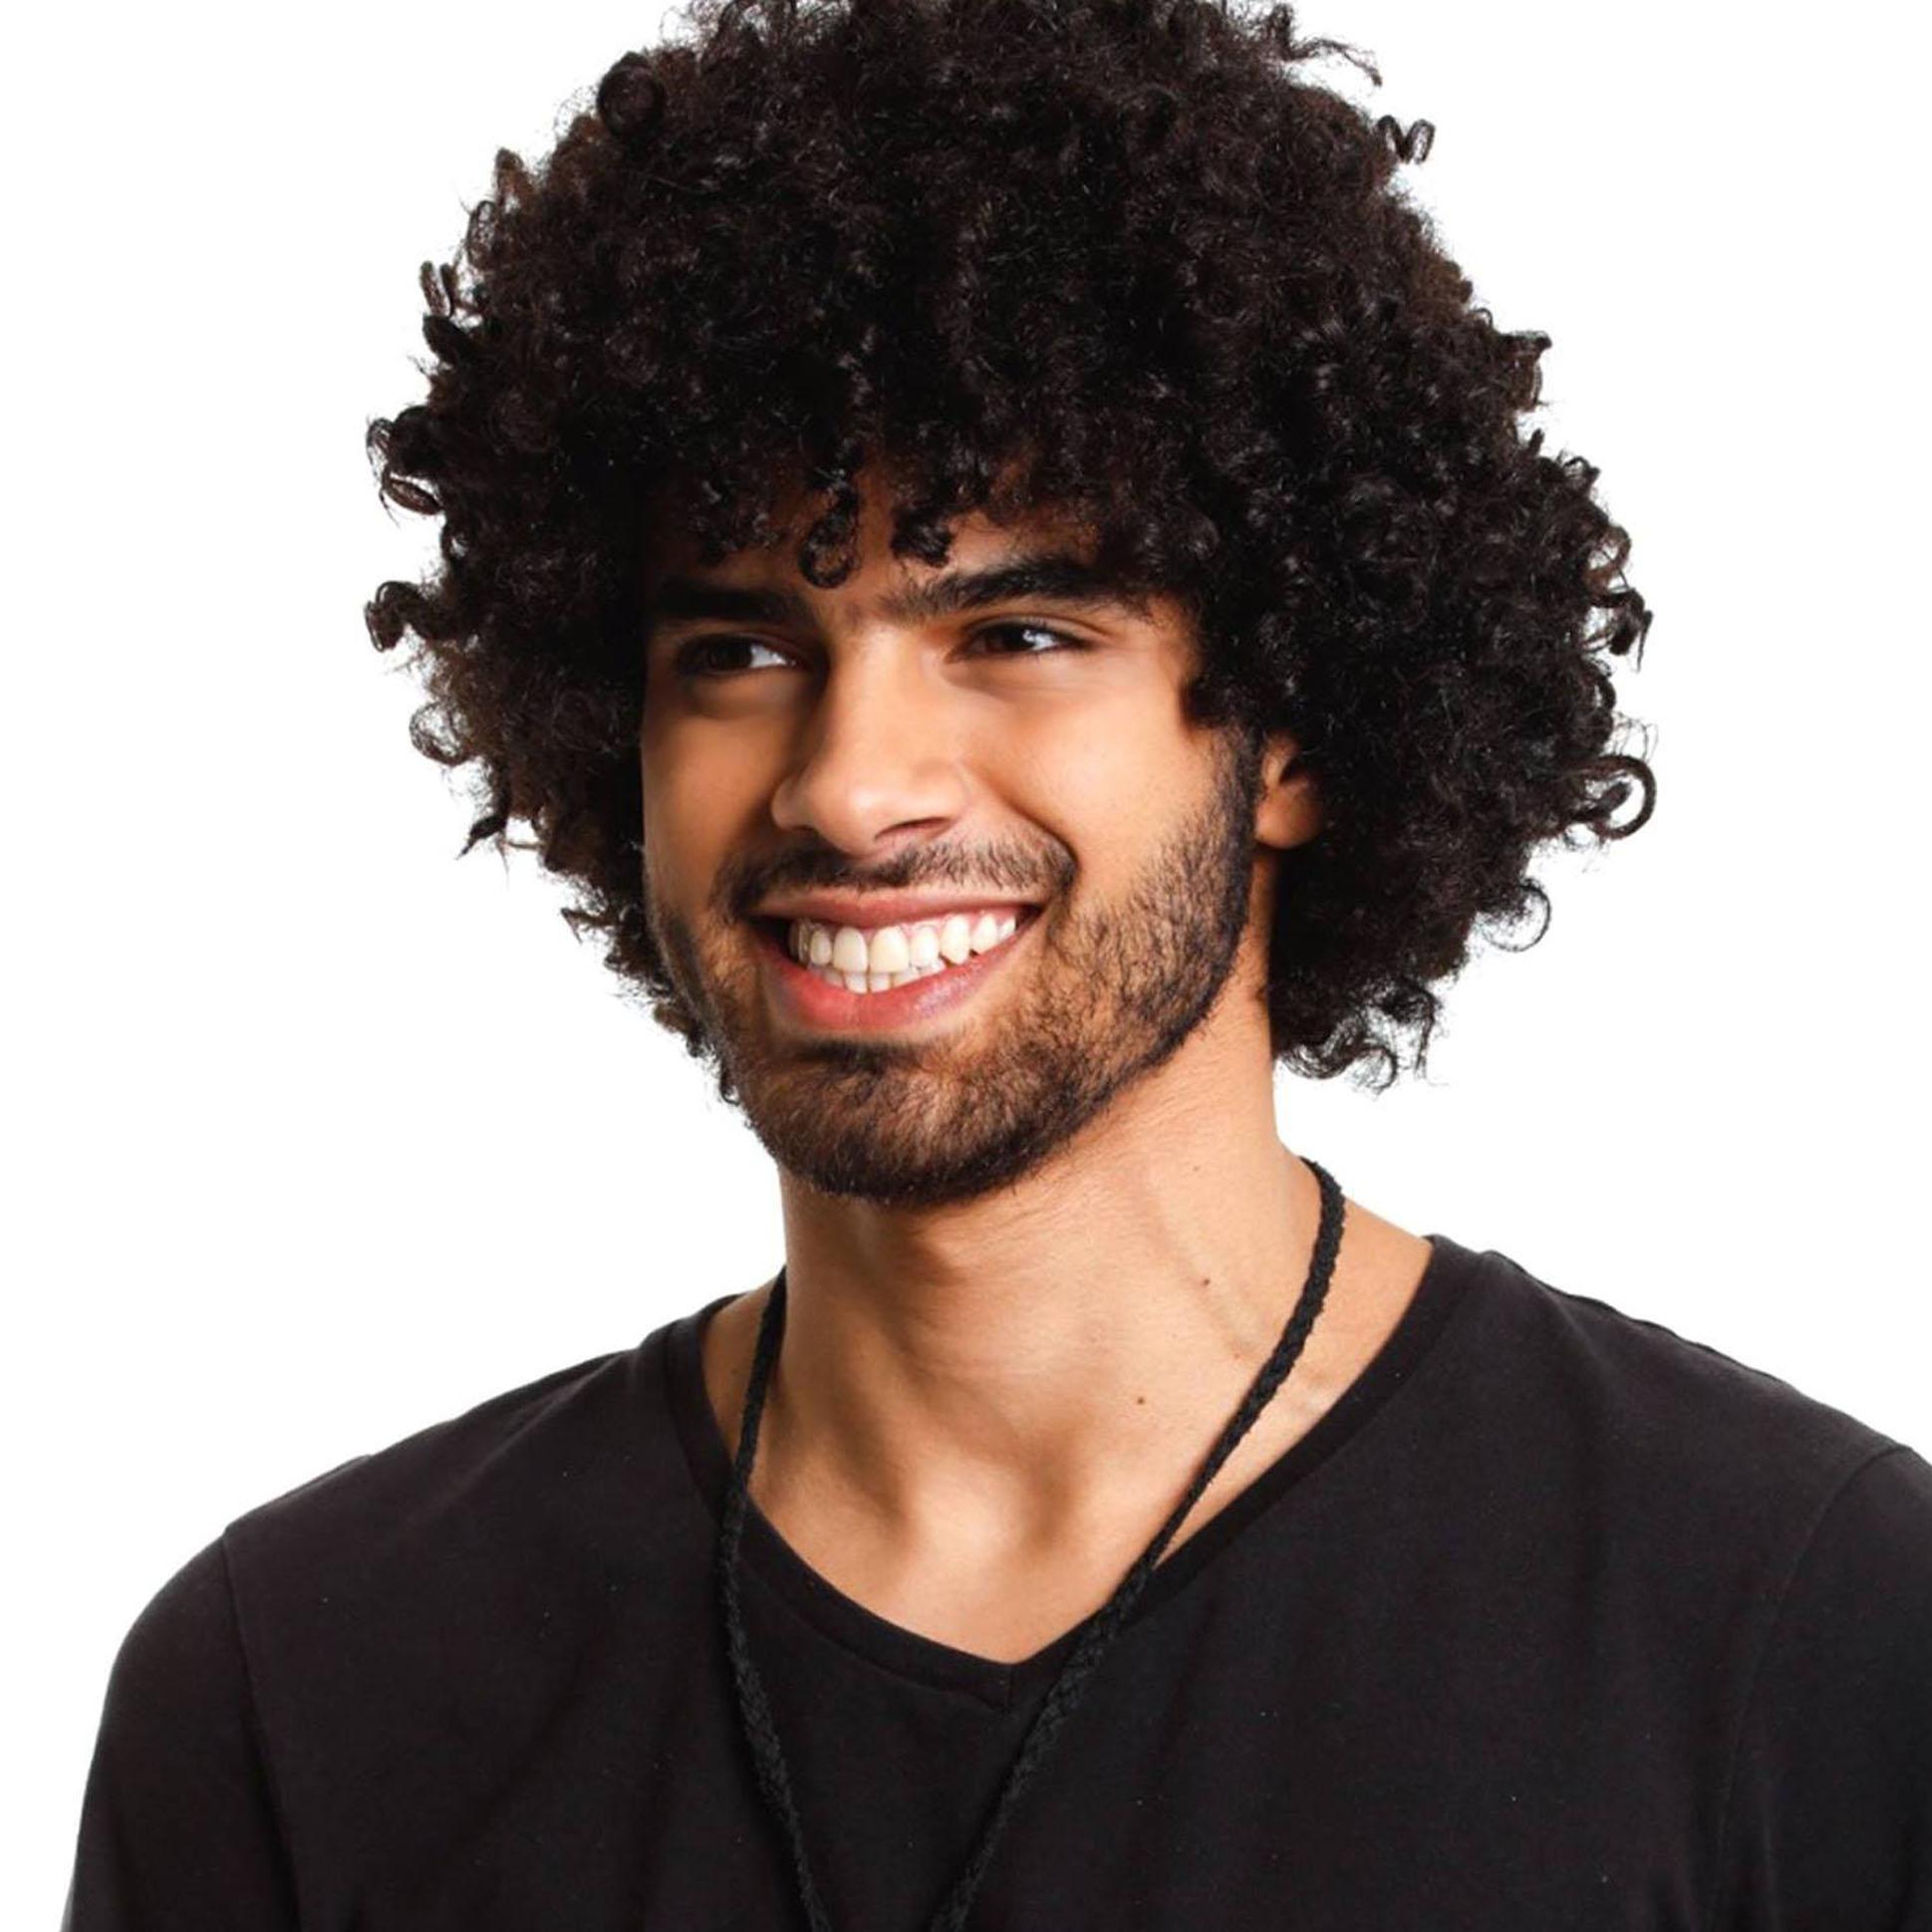 Evandro Almeida